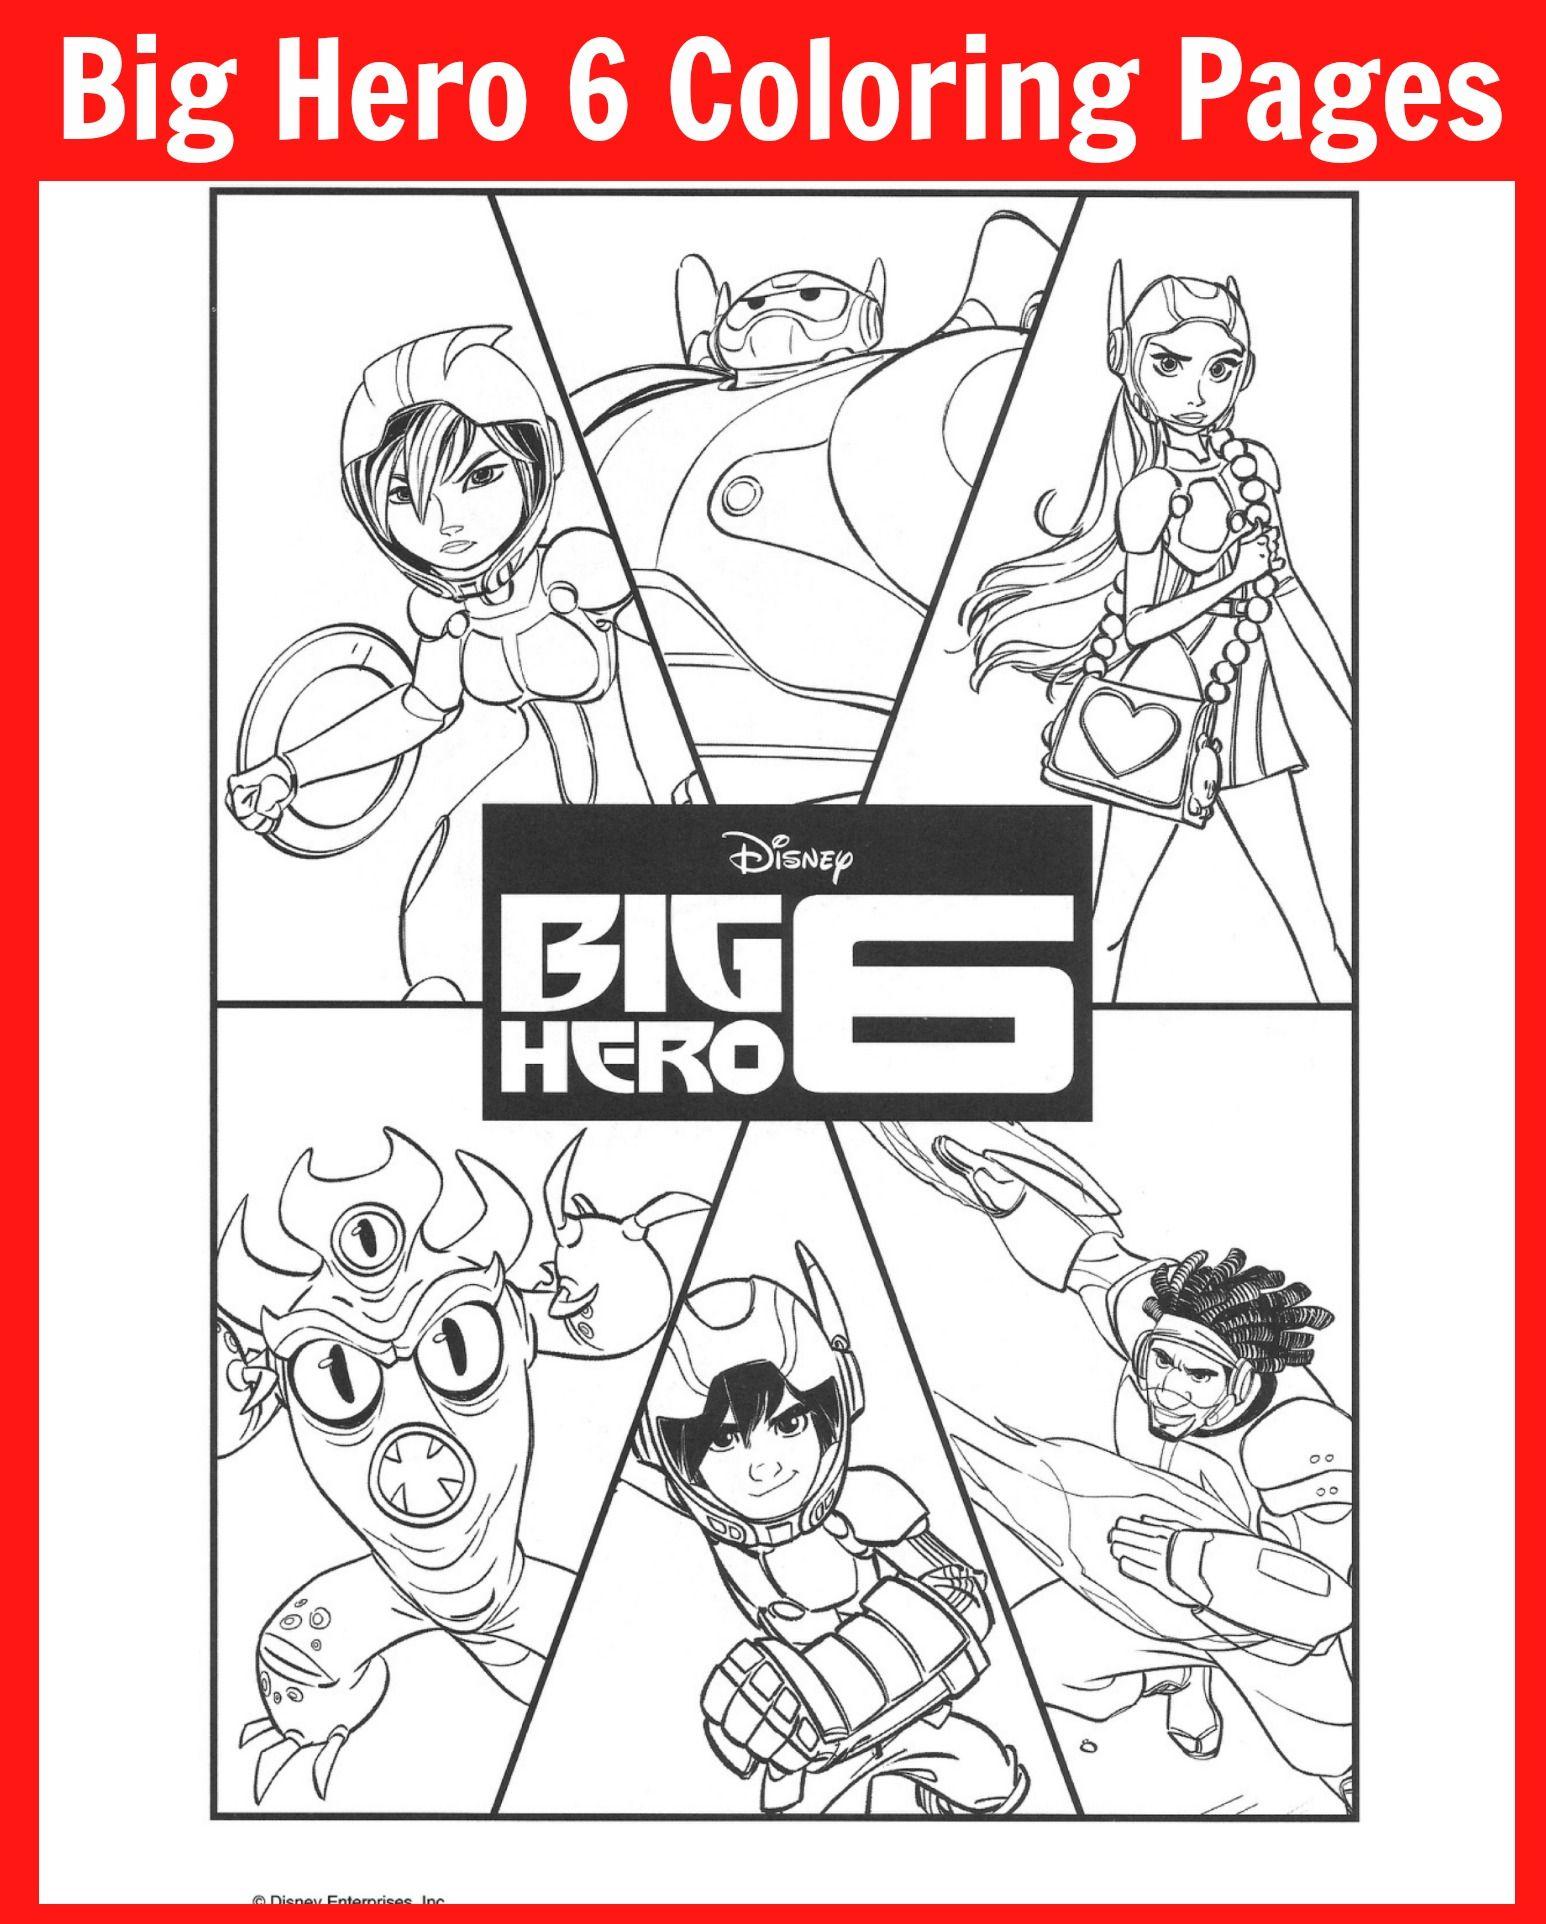 Colouring in sheets big hero 6 - Big Hero 6 Coloring Pages And Activity Sheets Bighero6